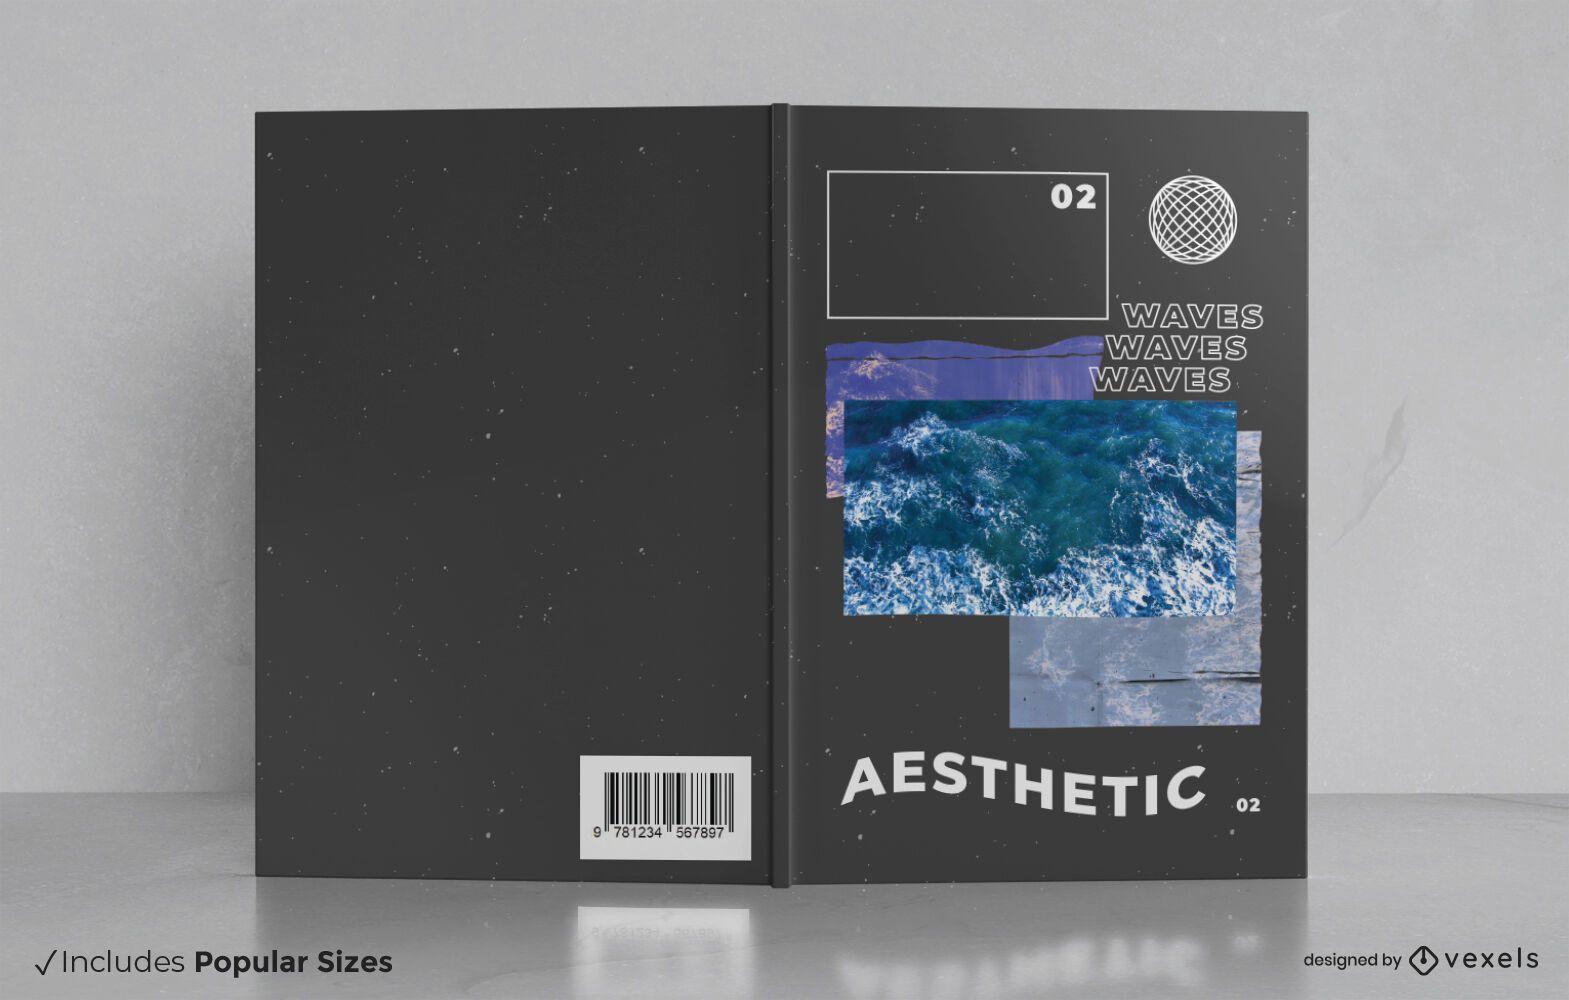 Aesthetic vaporwave book cover design